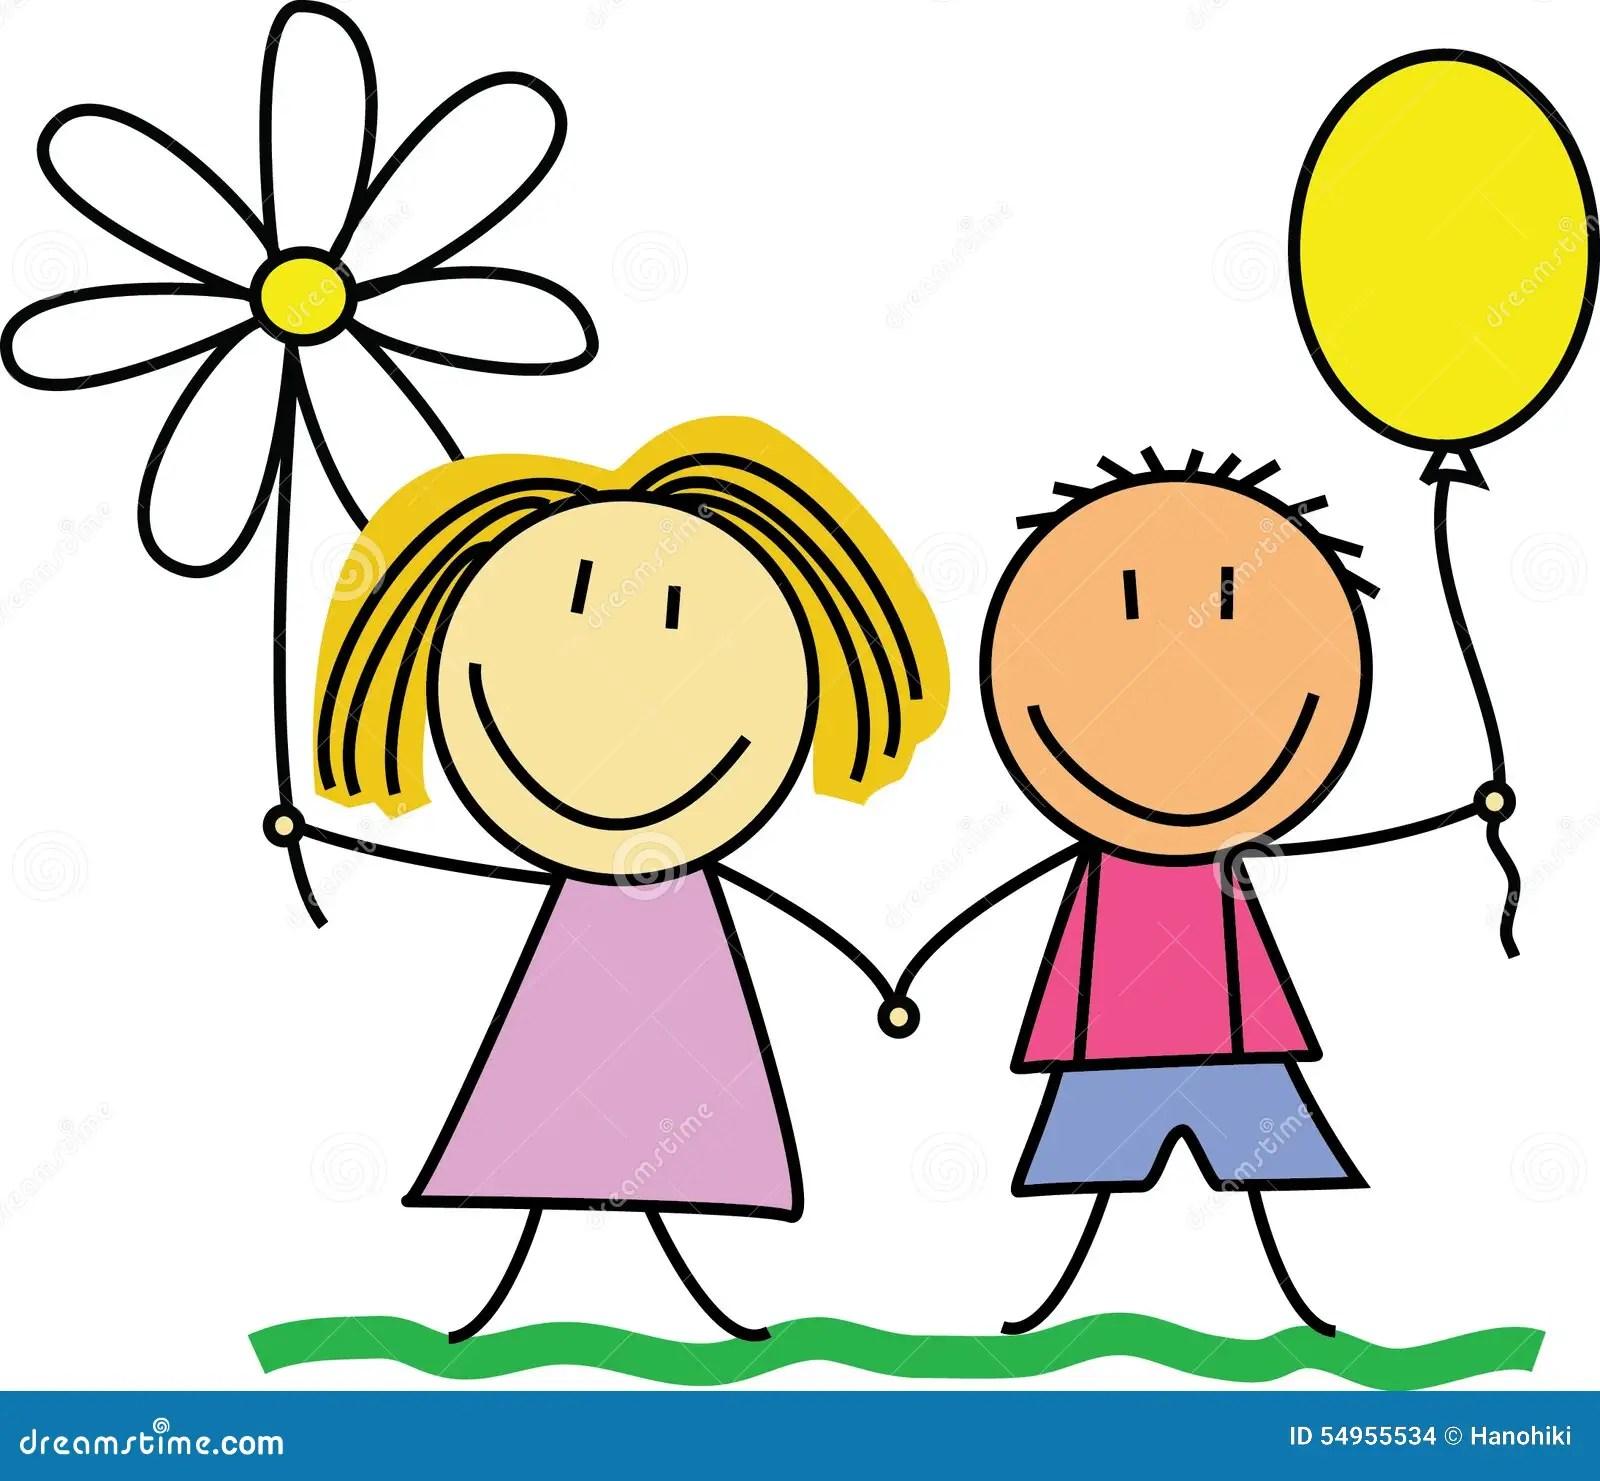 Cute Emoji Wallpapers For Girls Friends Friendship Kids Drawing Illustration Stock